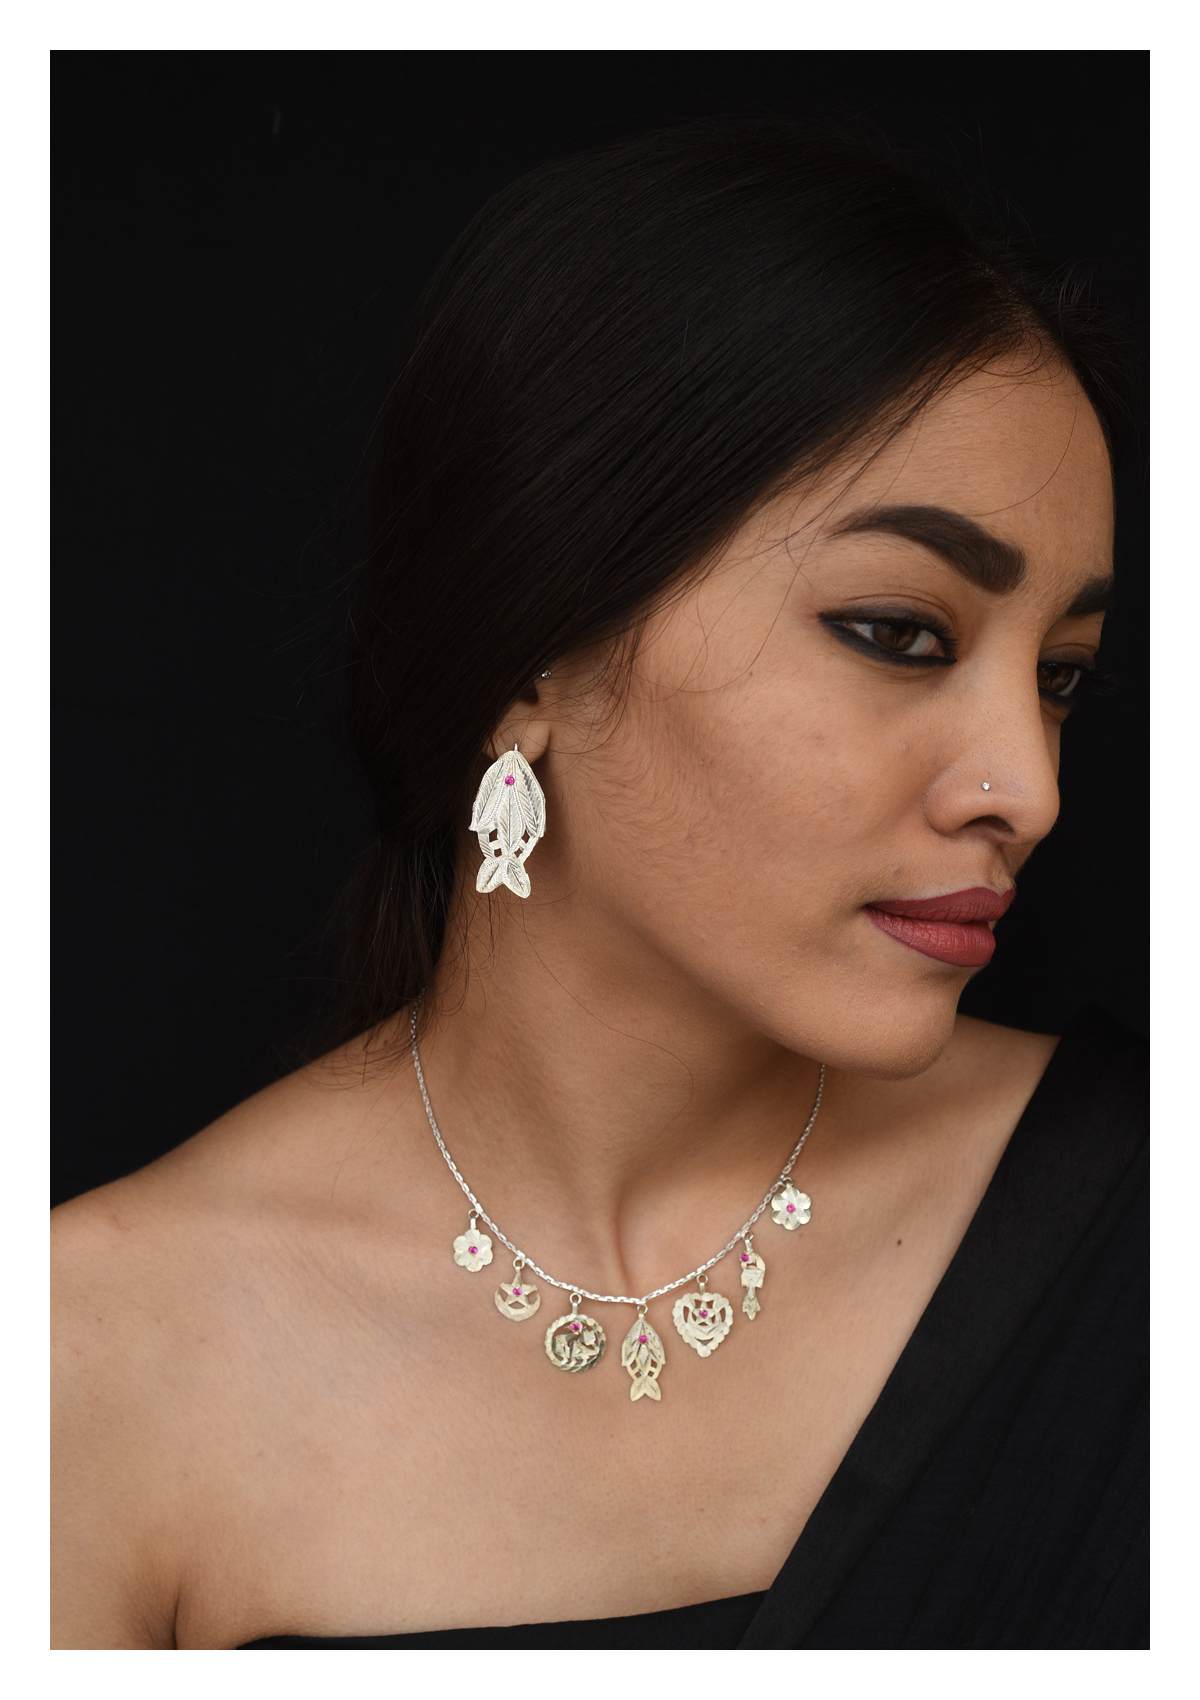 Machli Handmade Silver Earrings